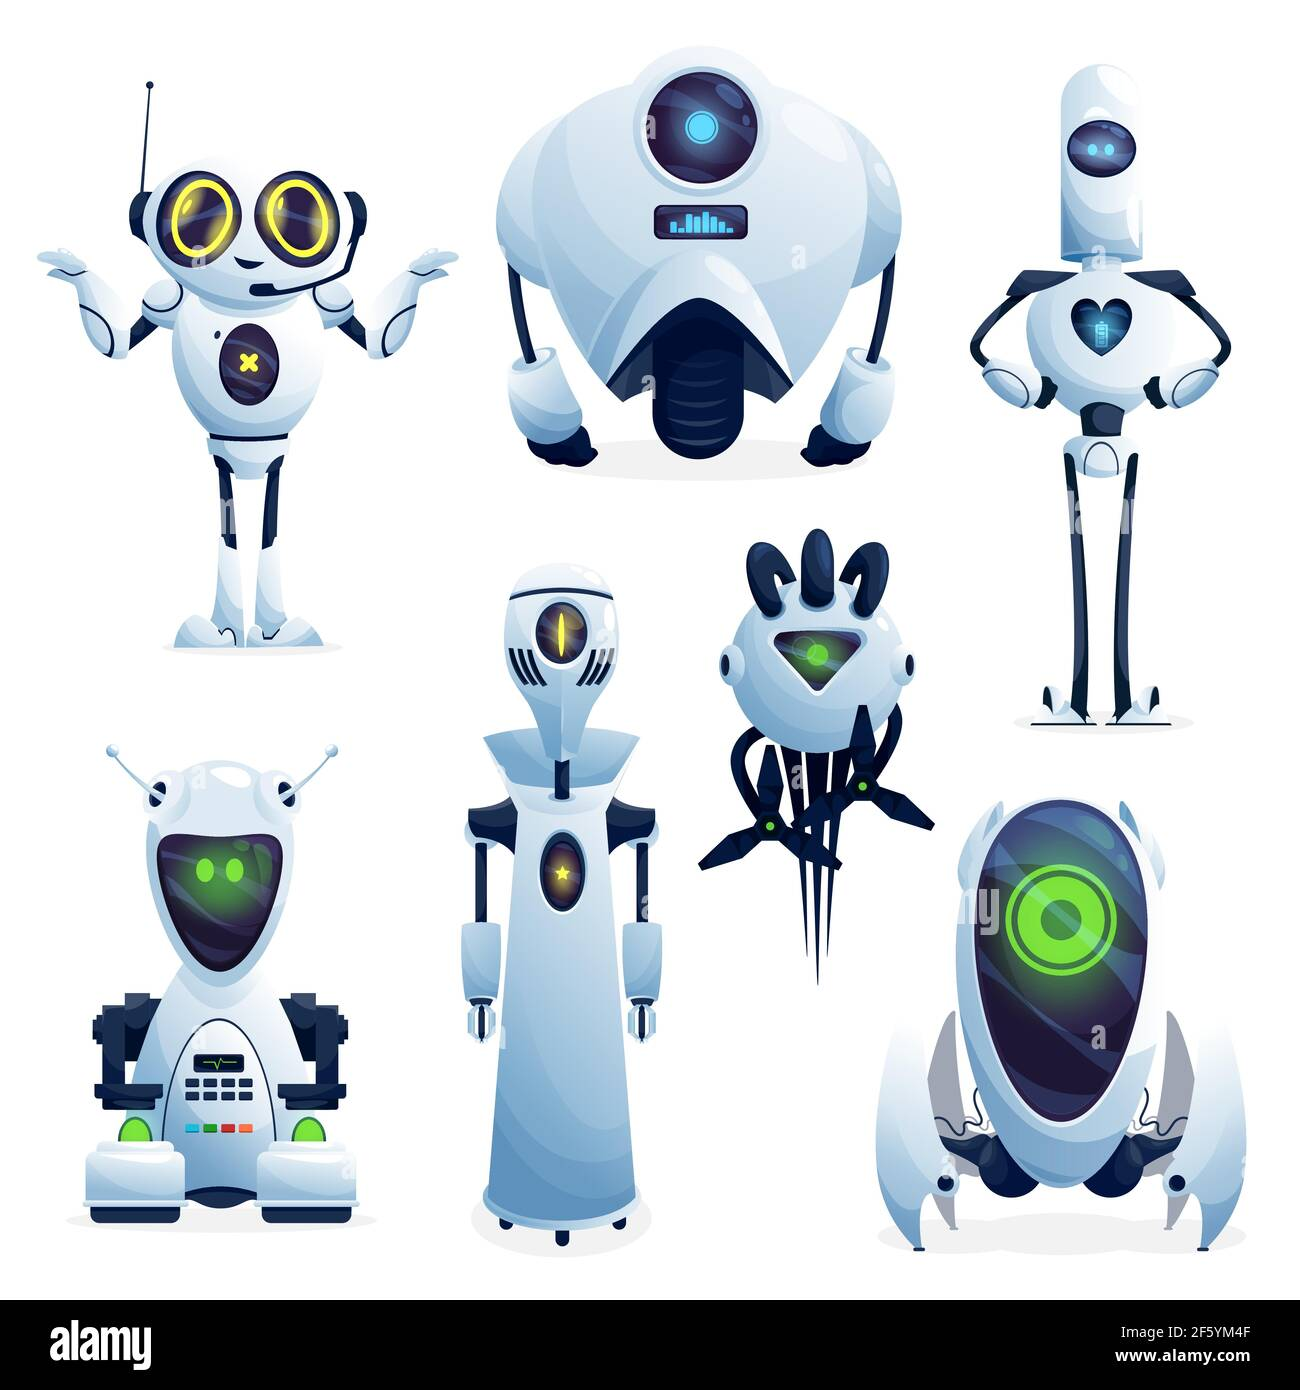 Cartoon robots, vector cyborg characters, toys or bots, artificial ...